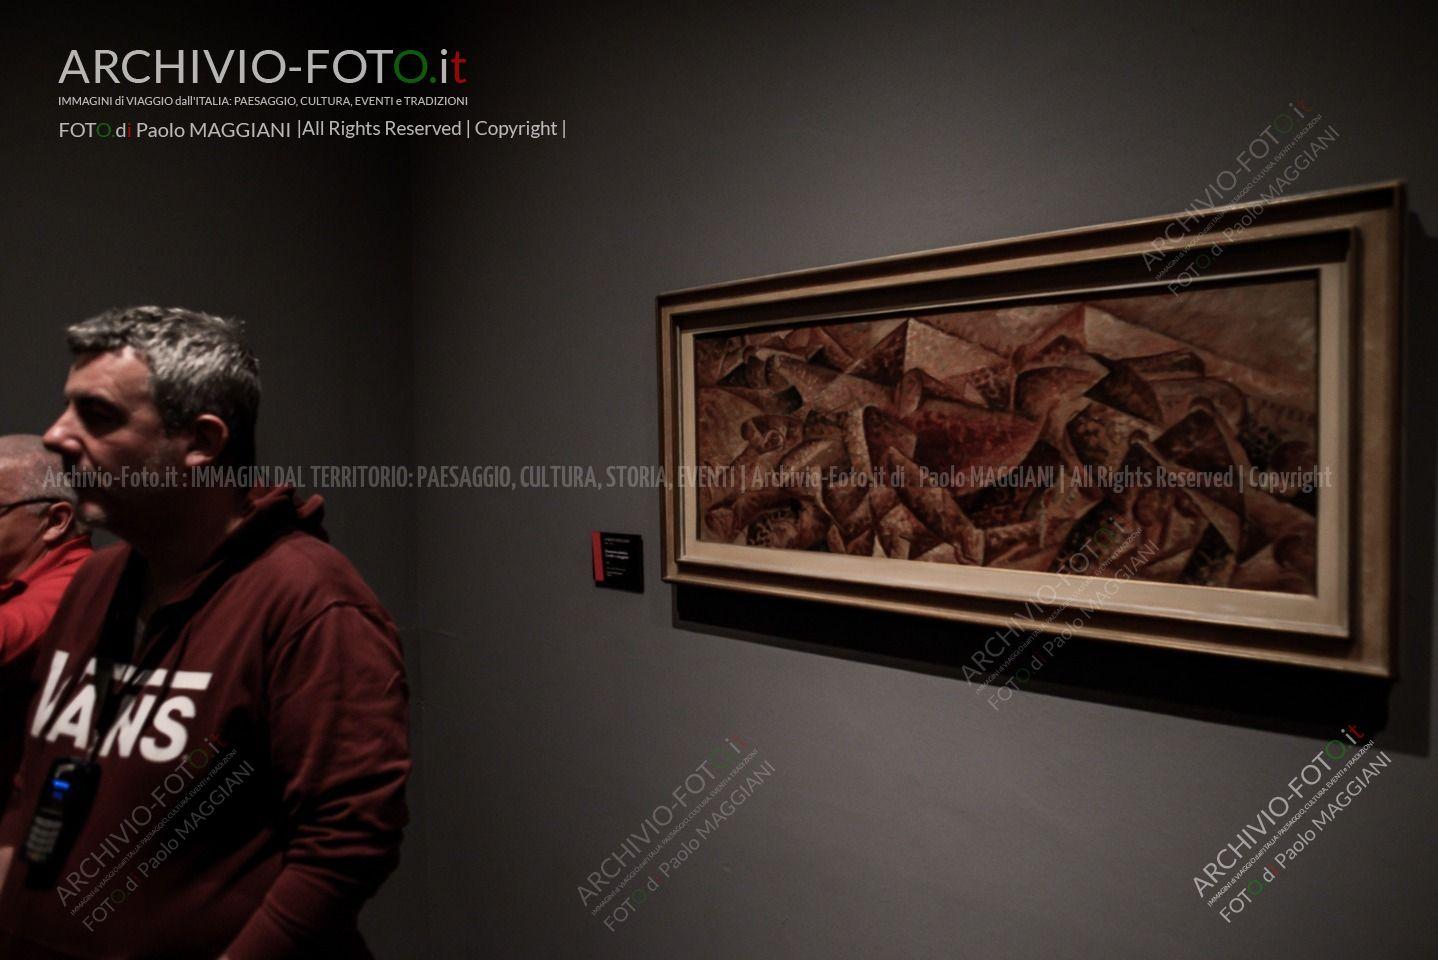 Futuristi_Palazzo_Blu_Pisa_PaoloMaggiani_it_185ND61020P_MAG0629